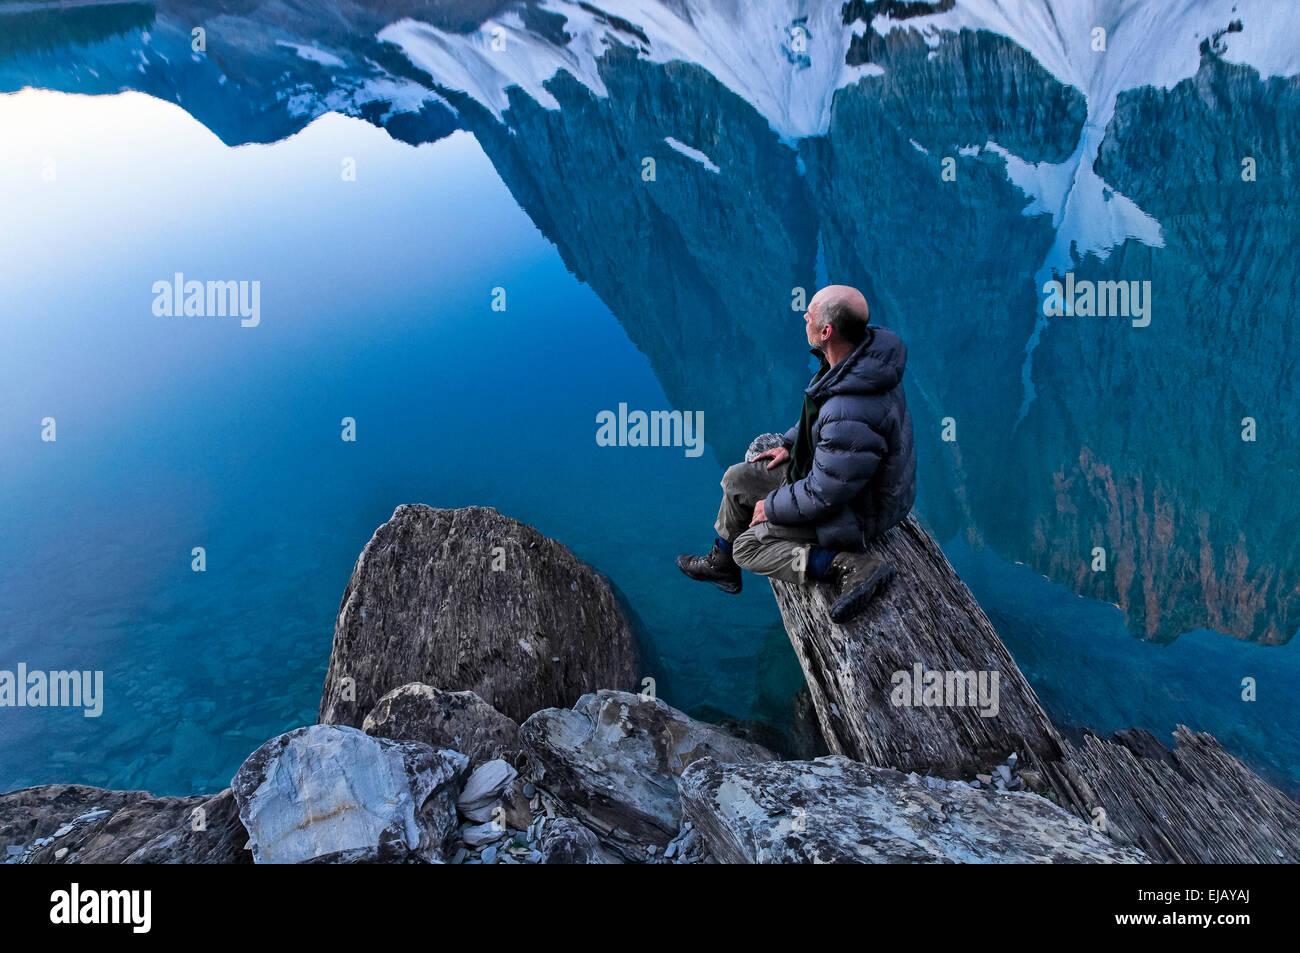 Man enjoys the calm of morning,  the Rockwall at Floe Lake, Kootenay National Park, British Columbia, Canada - Stock Image